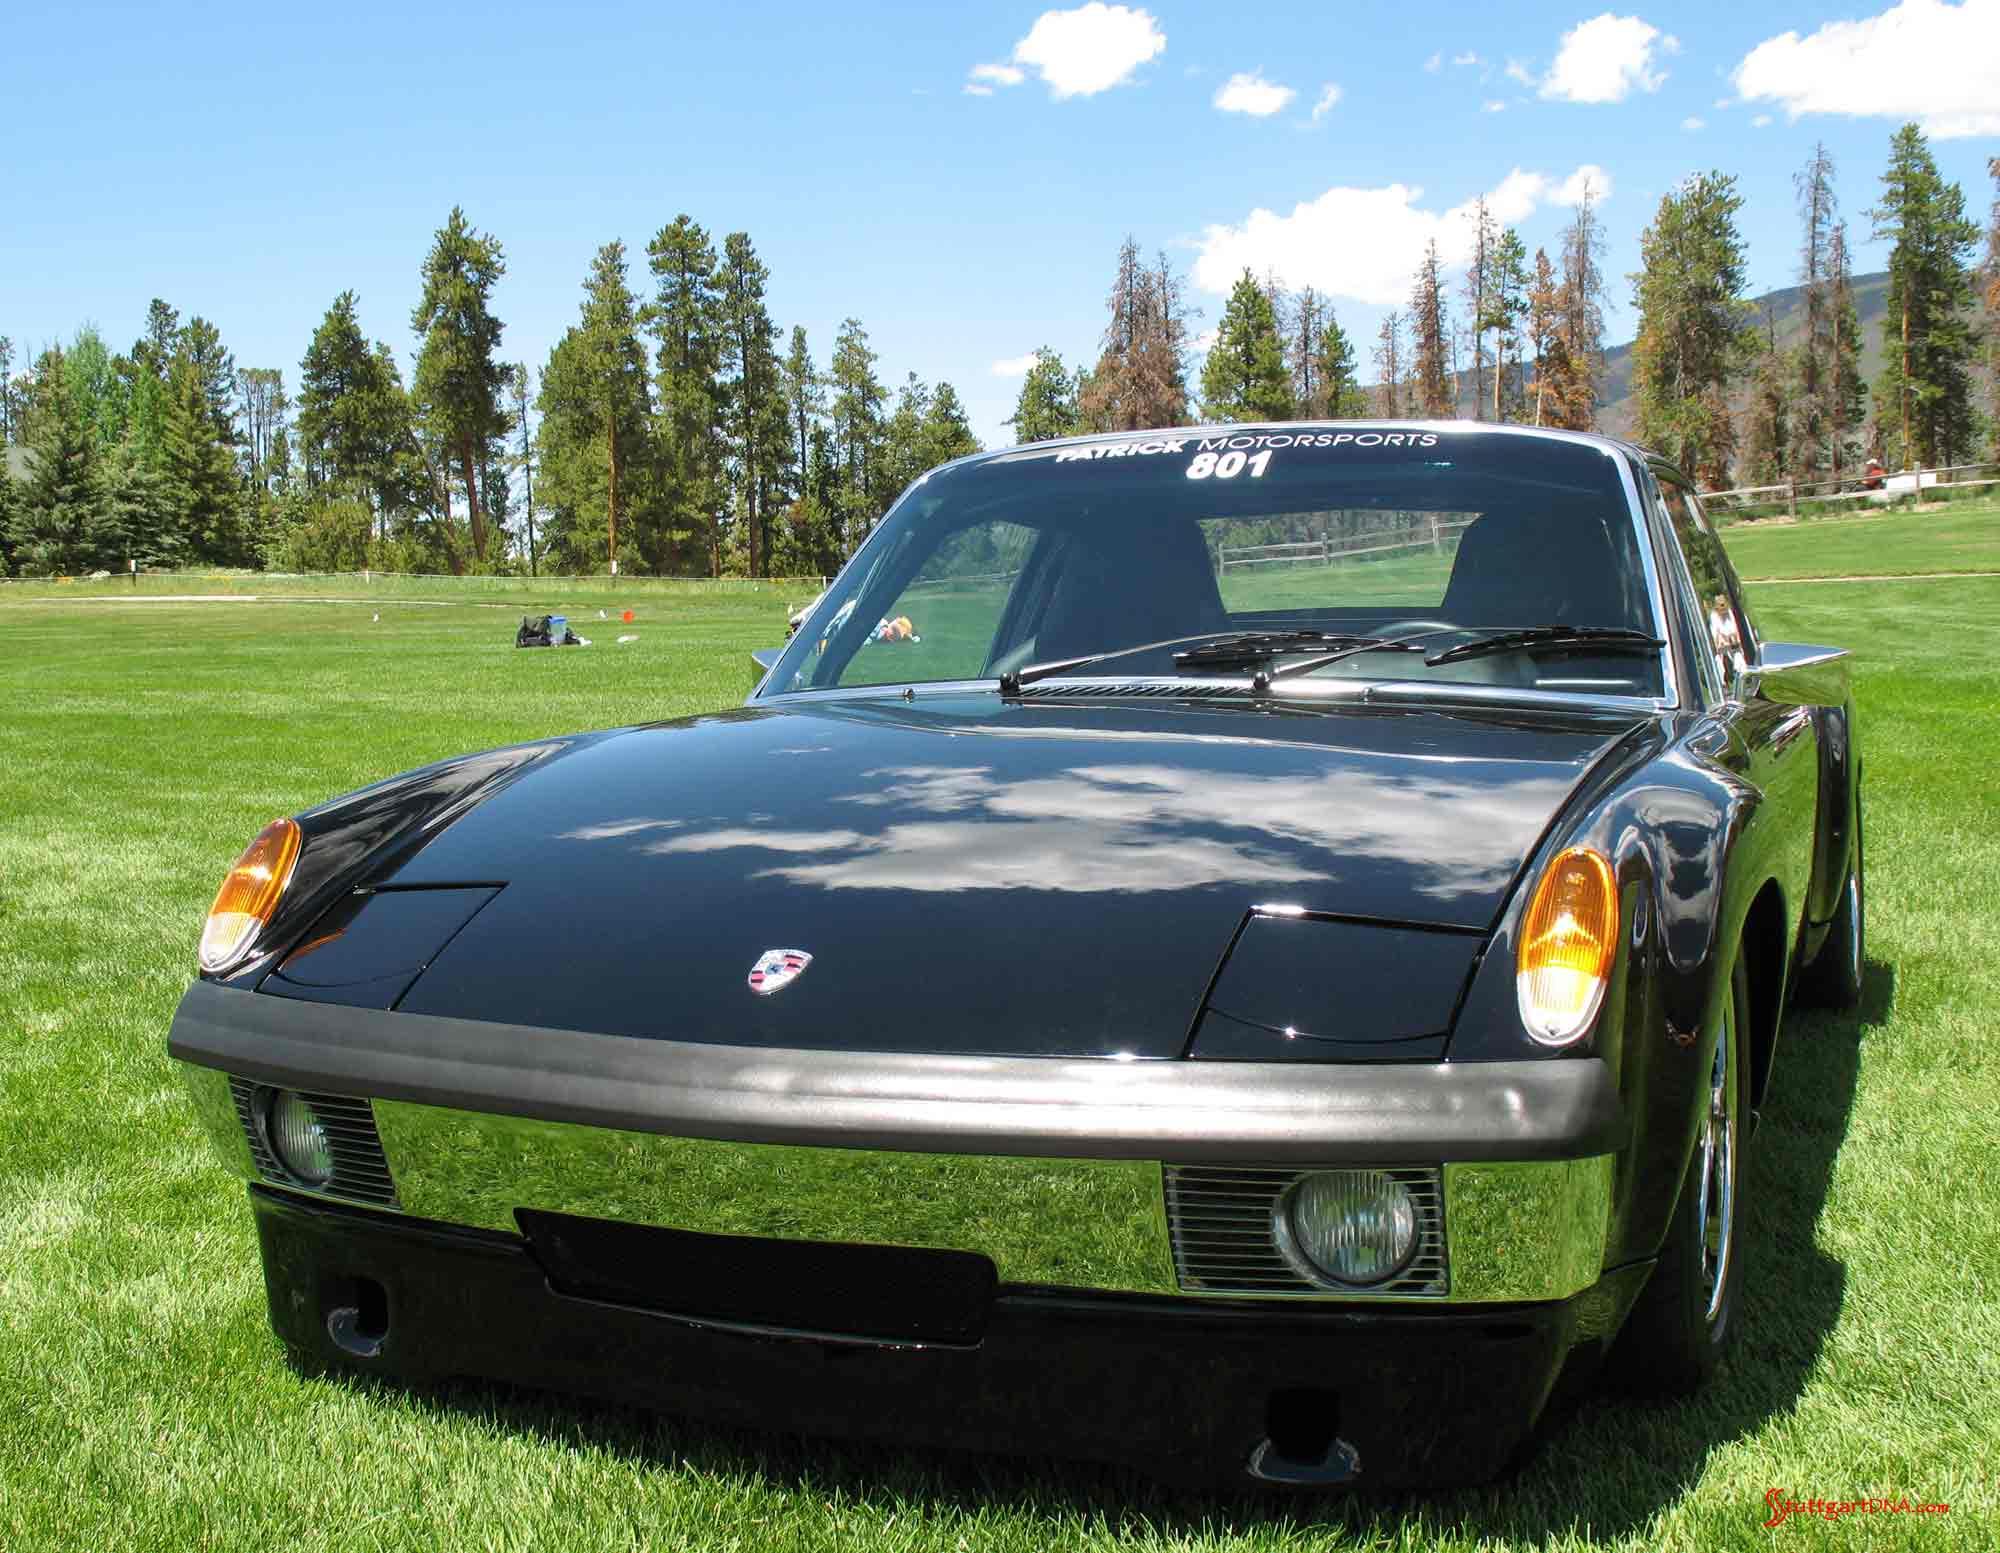 Porsche Clubs: 914 front-left at Colorado 54 Porsche Parade, 2009. Credit: StuttgartDNA